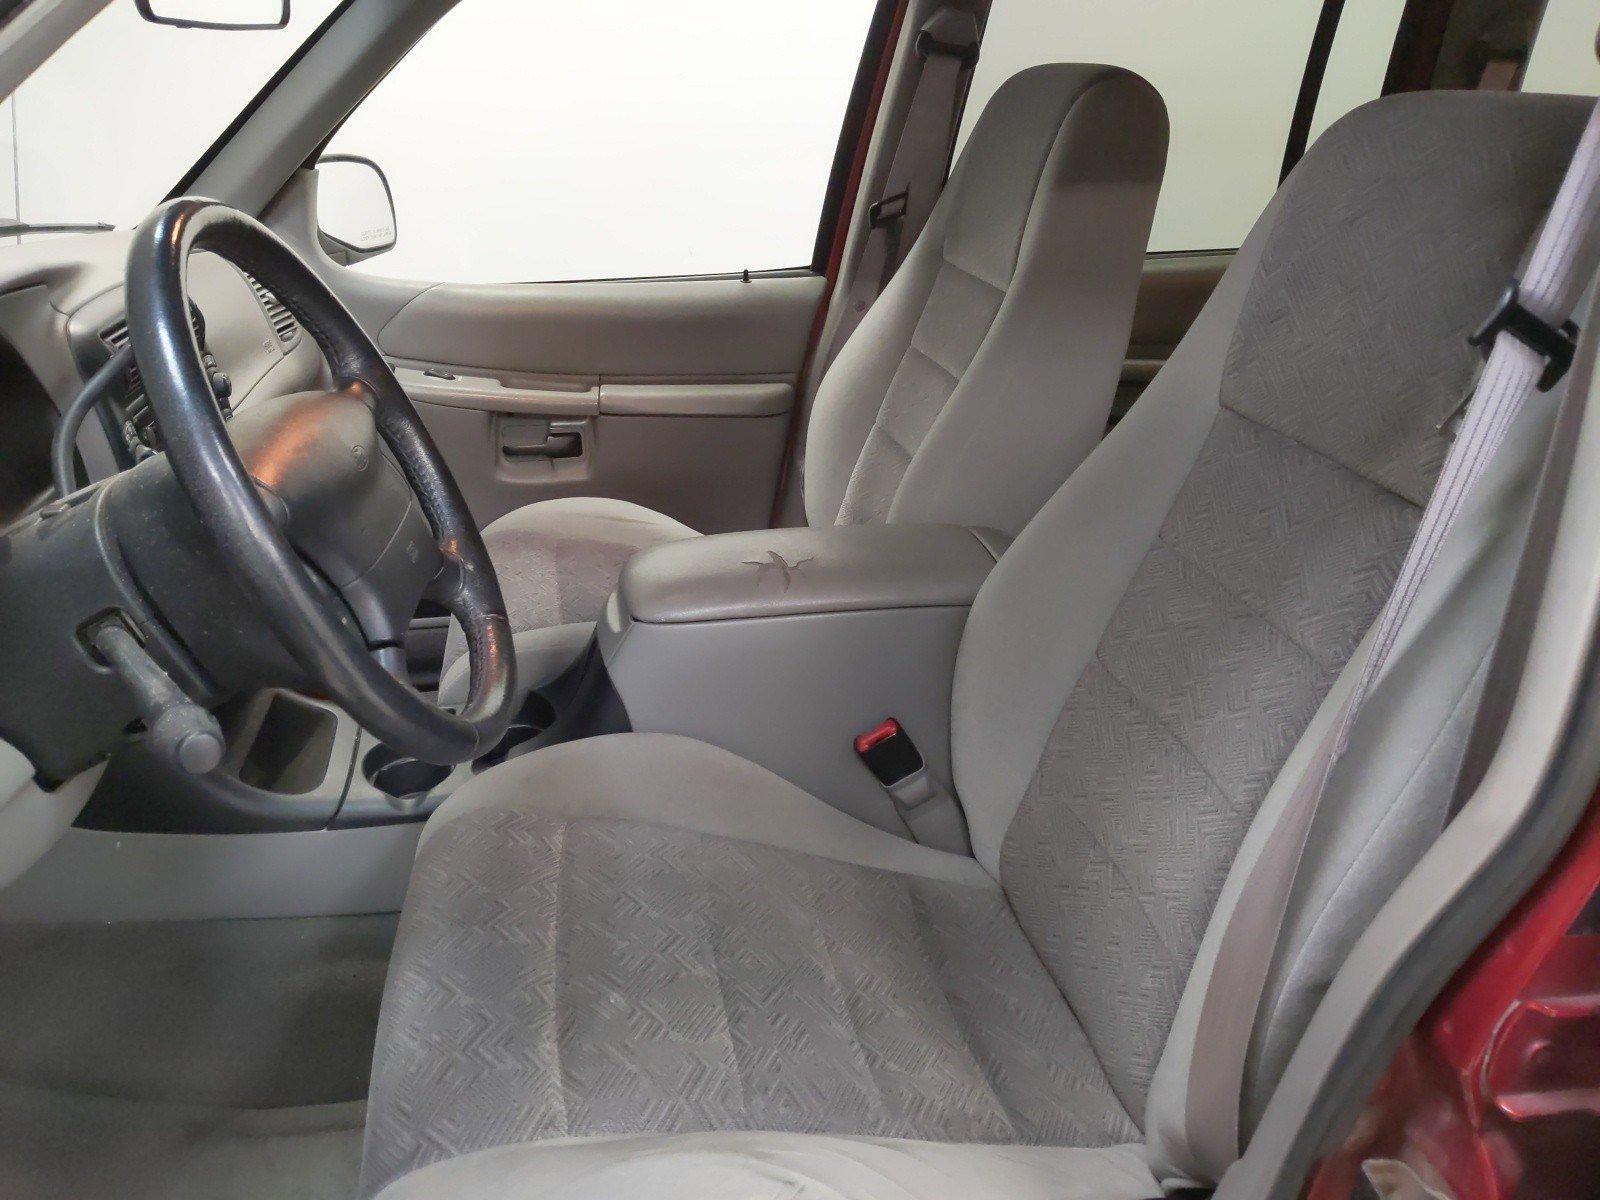 Used 2000 Ford Explorer XLT 4D Sport Utility for sale in Grand Island NE